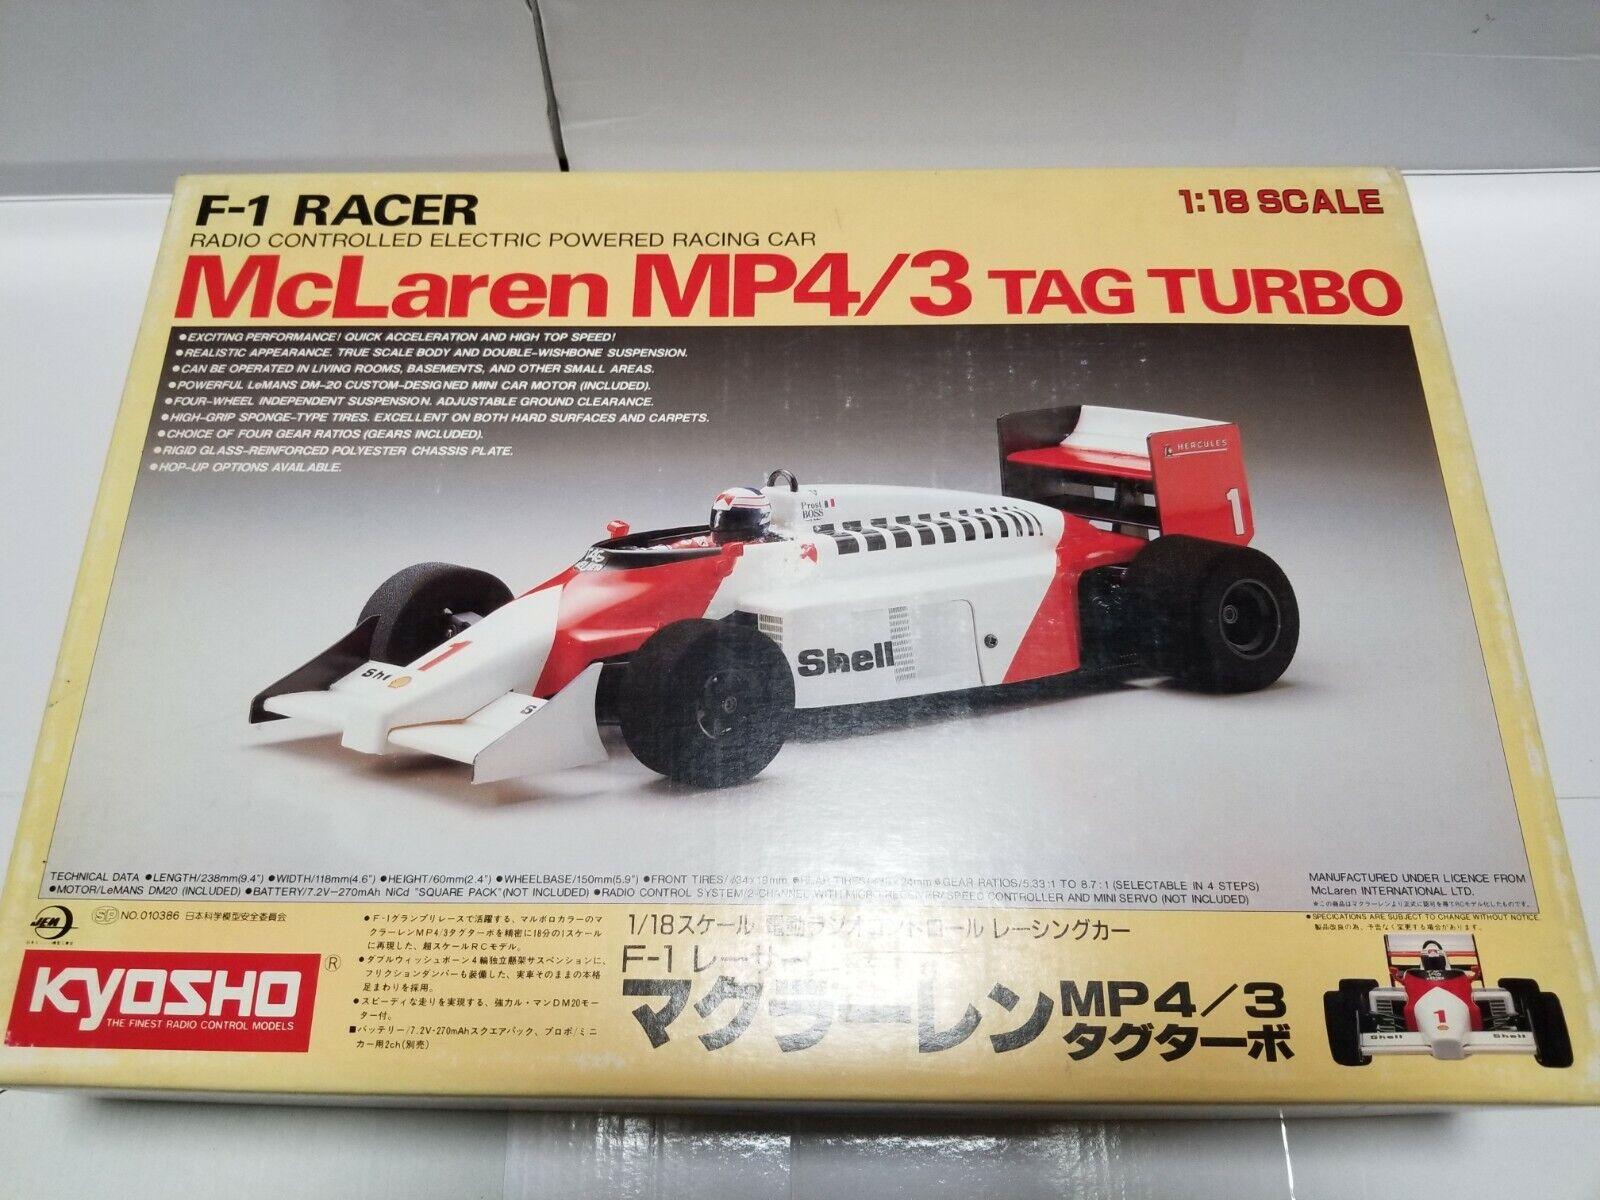 KYOSHO 1 18 Radio Control Car MCLAREN MP4 3 TAG TURBO